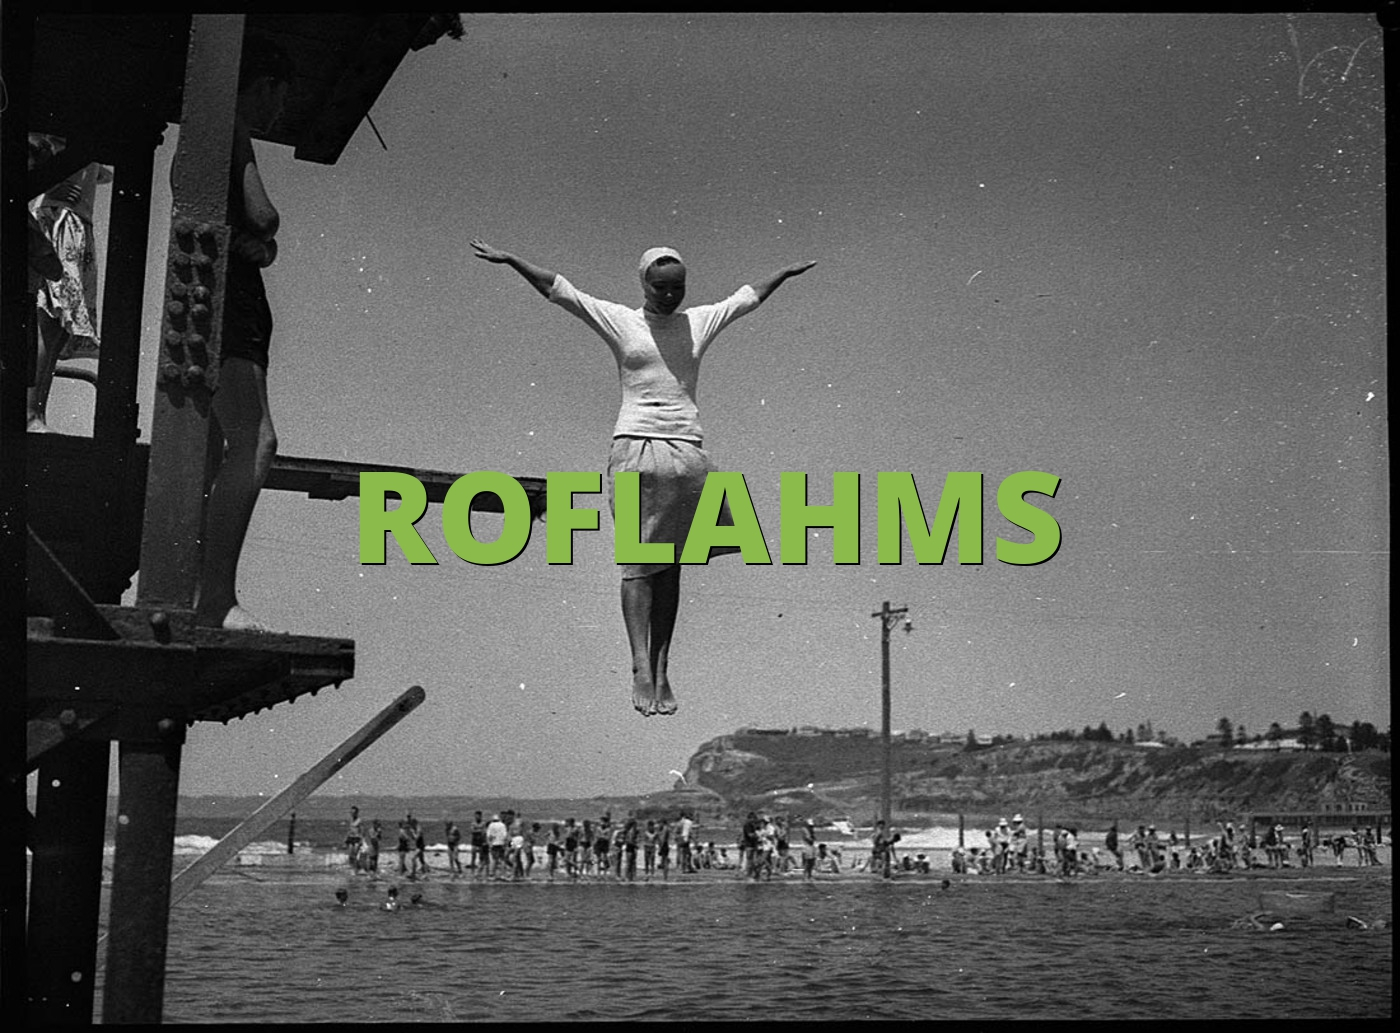 ROFLAHMS